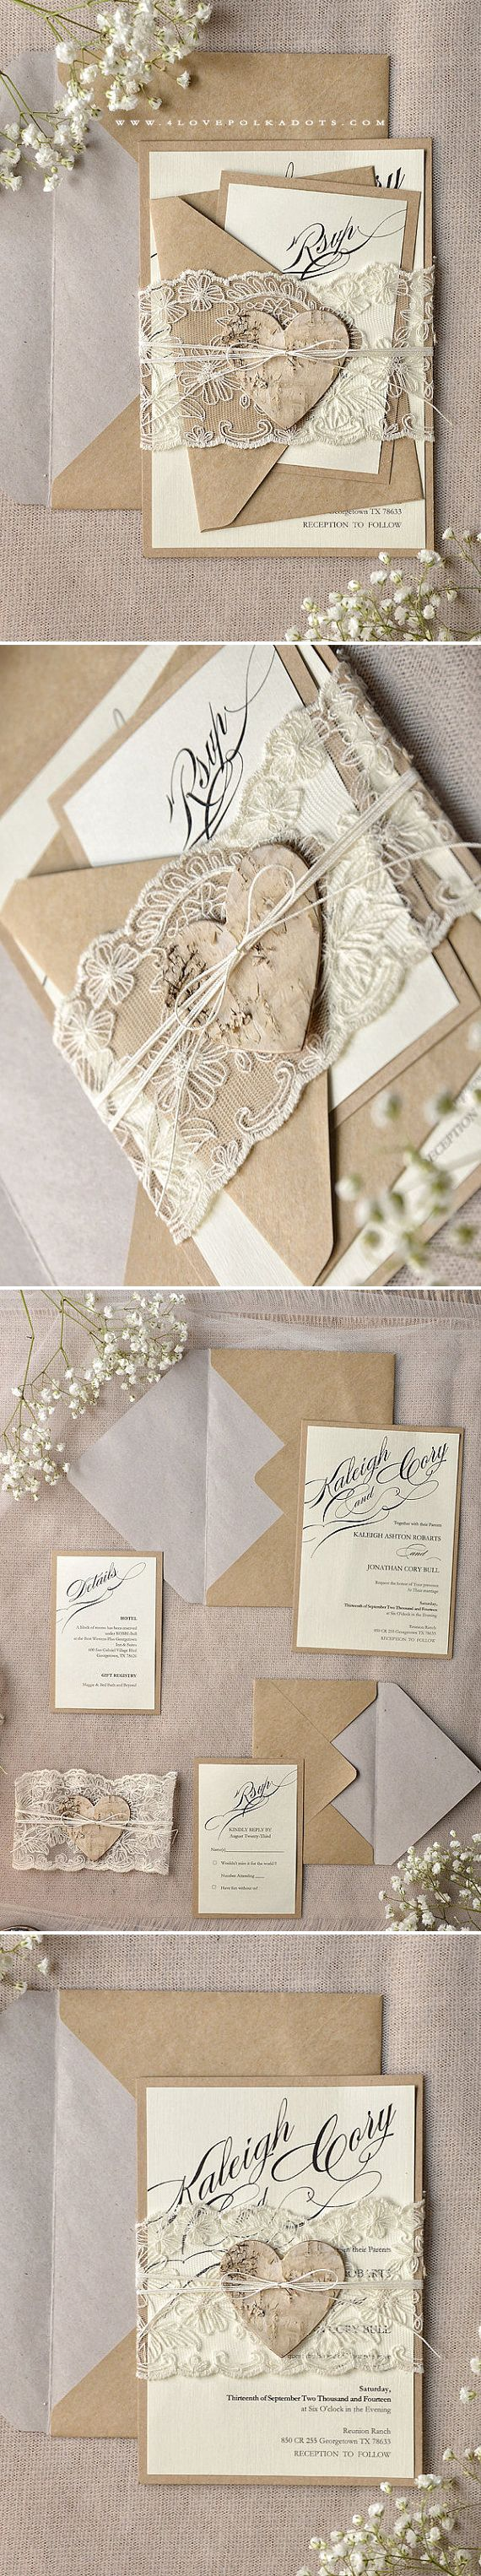 lace wedding invitation wrap%0A Rustic Romantic Wedding Invitations with real lace  u     birch bark heart tag u